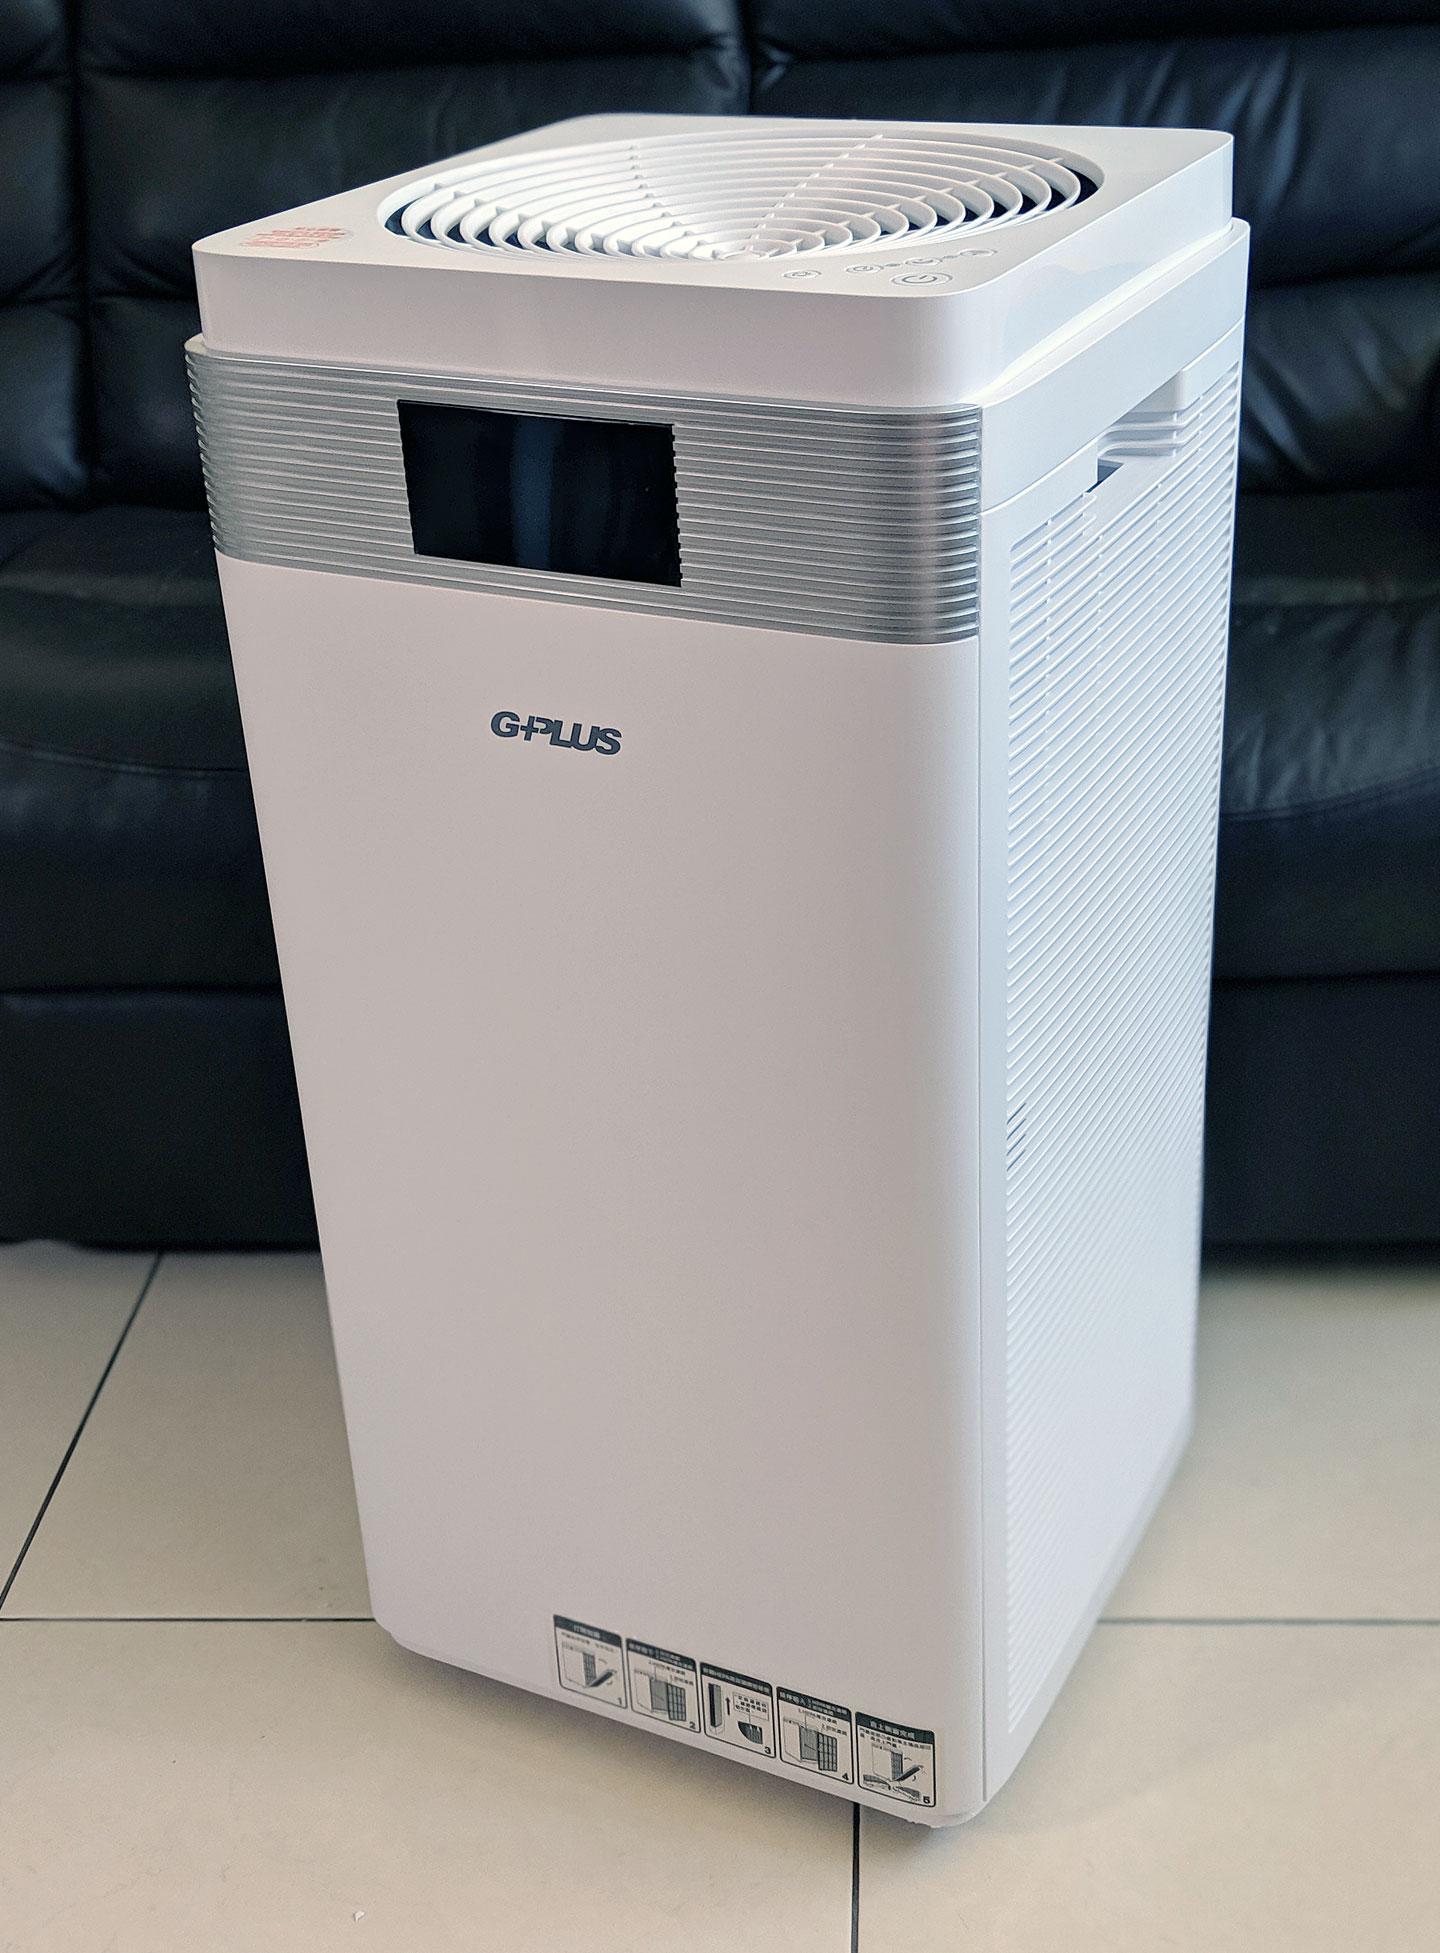 G-Plus Pro 1000 為四方柱體設計,純白的外殼加上機身簡約的設計,能輕易融入不同風格的裝潢環境。